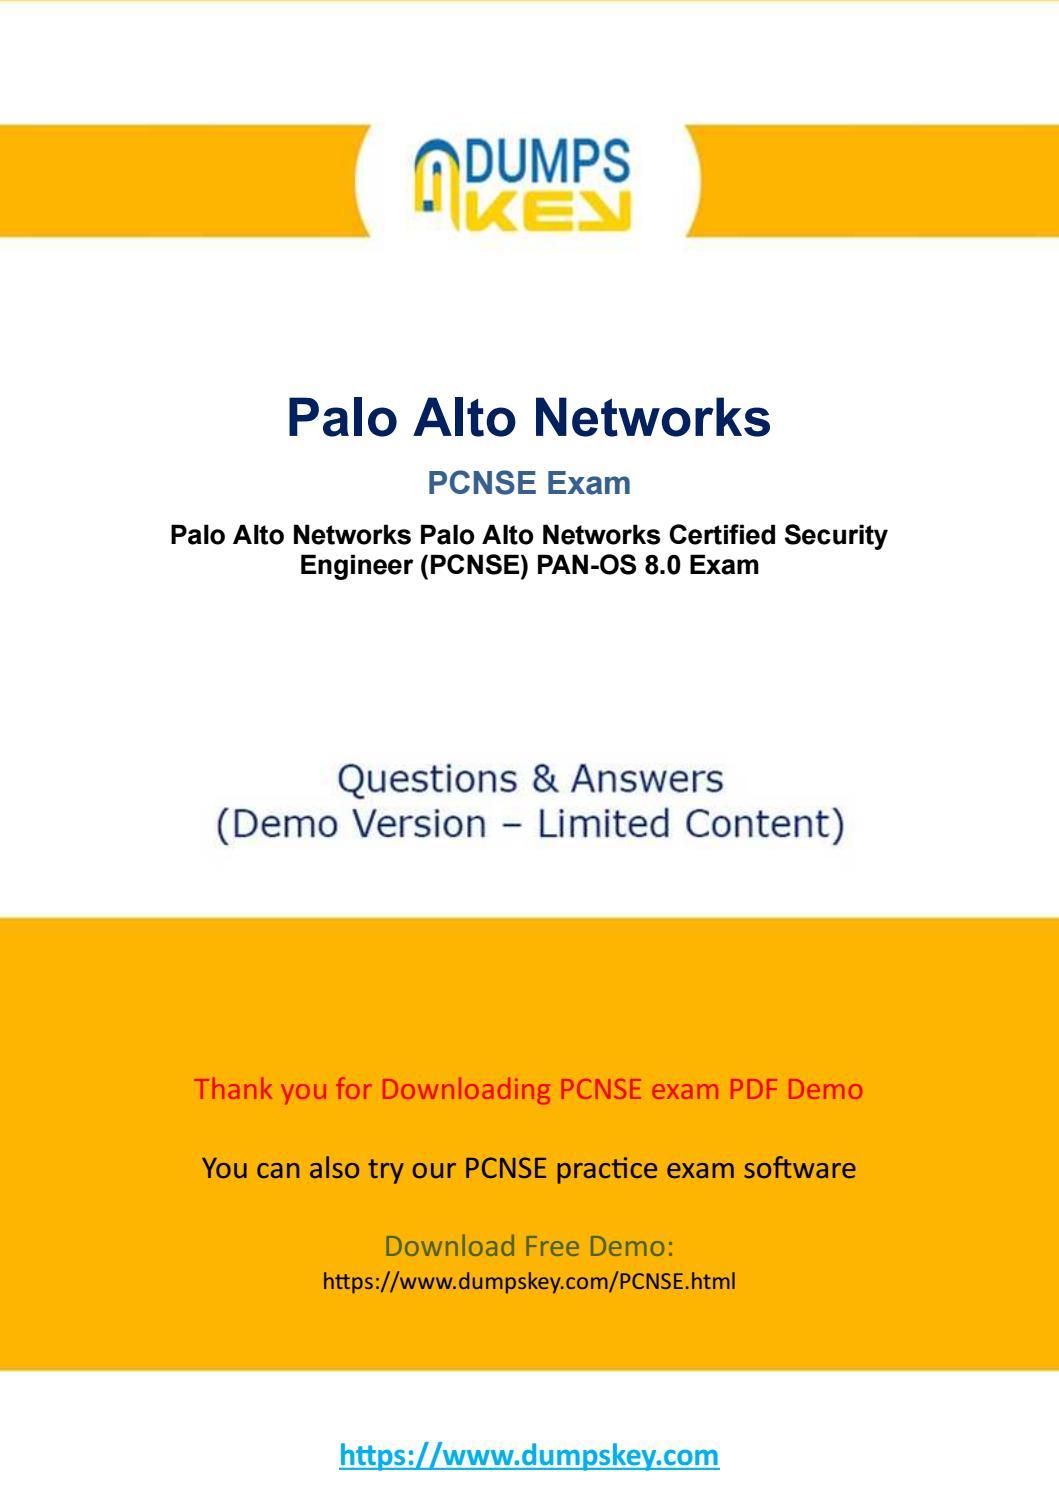 Actual PCNSE Dumps - Palo Alto Networks Certified Network